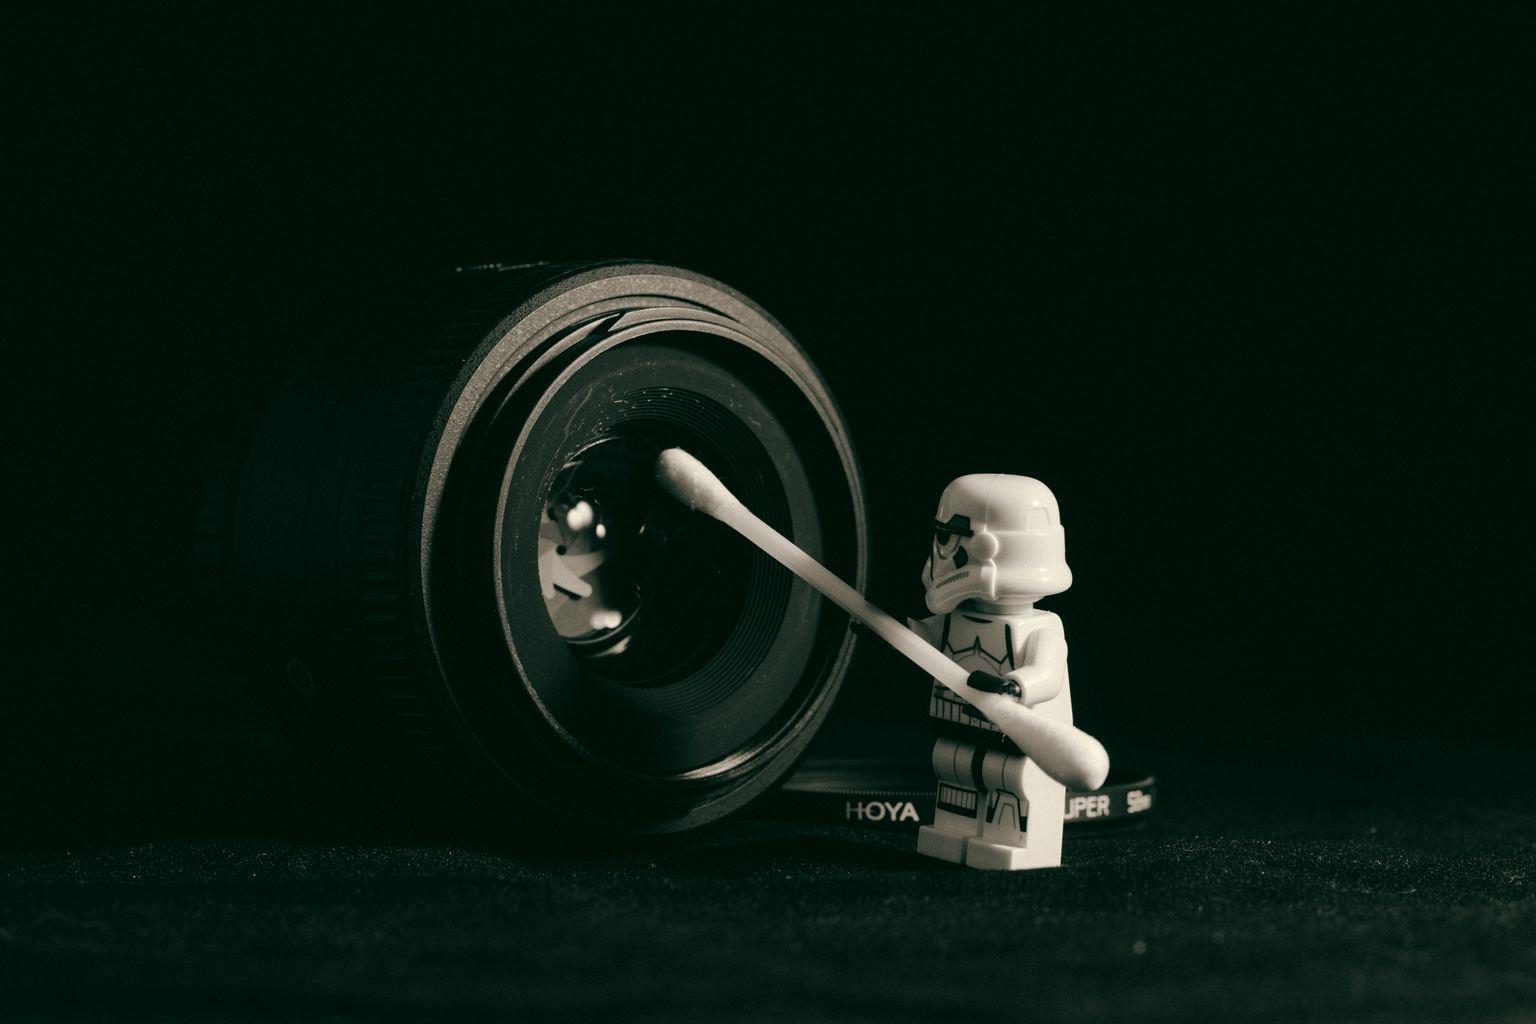 un muñeco lego limpiando un objetivo